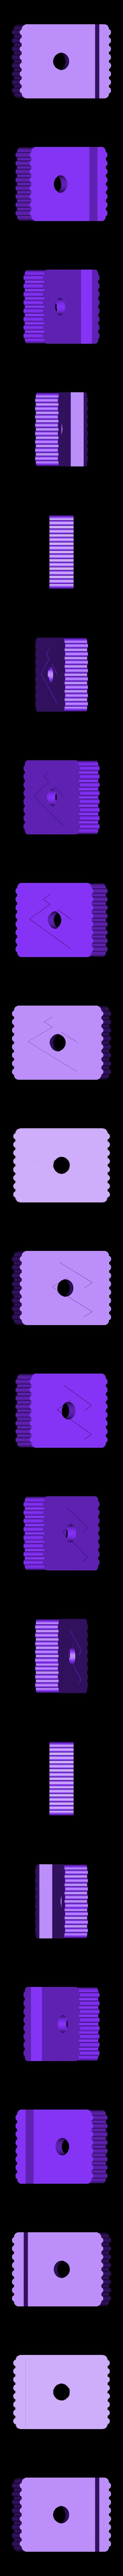 Spinner_Cover.stl Télécharger fichier STL gratuit Bayblade Fidget Toy • Modèle à imprimer en 3D, PentlandDesigns